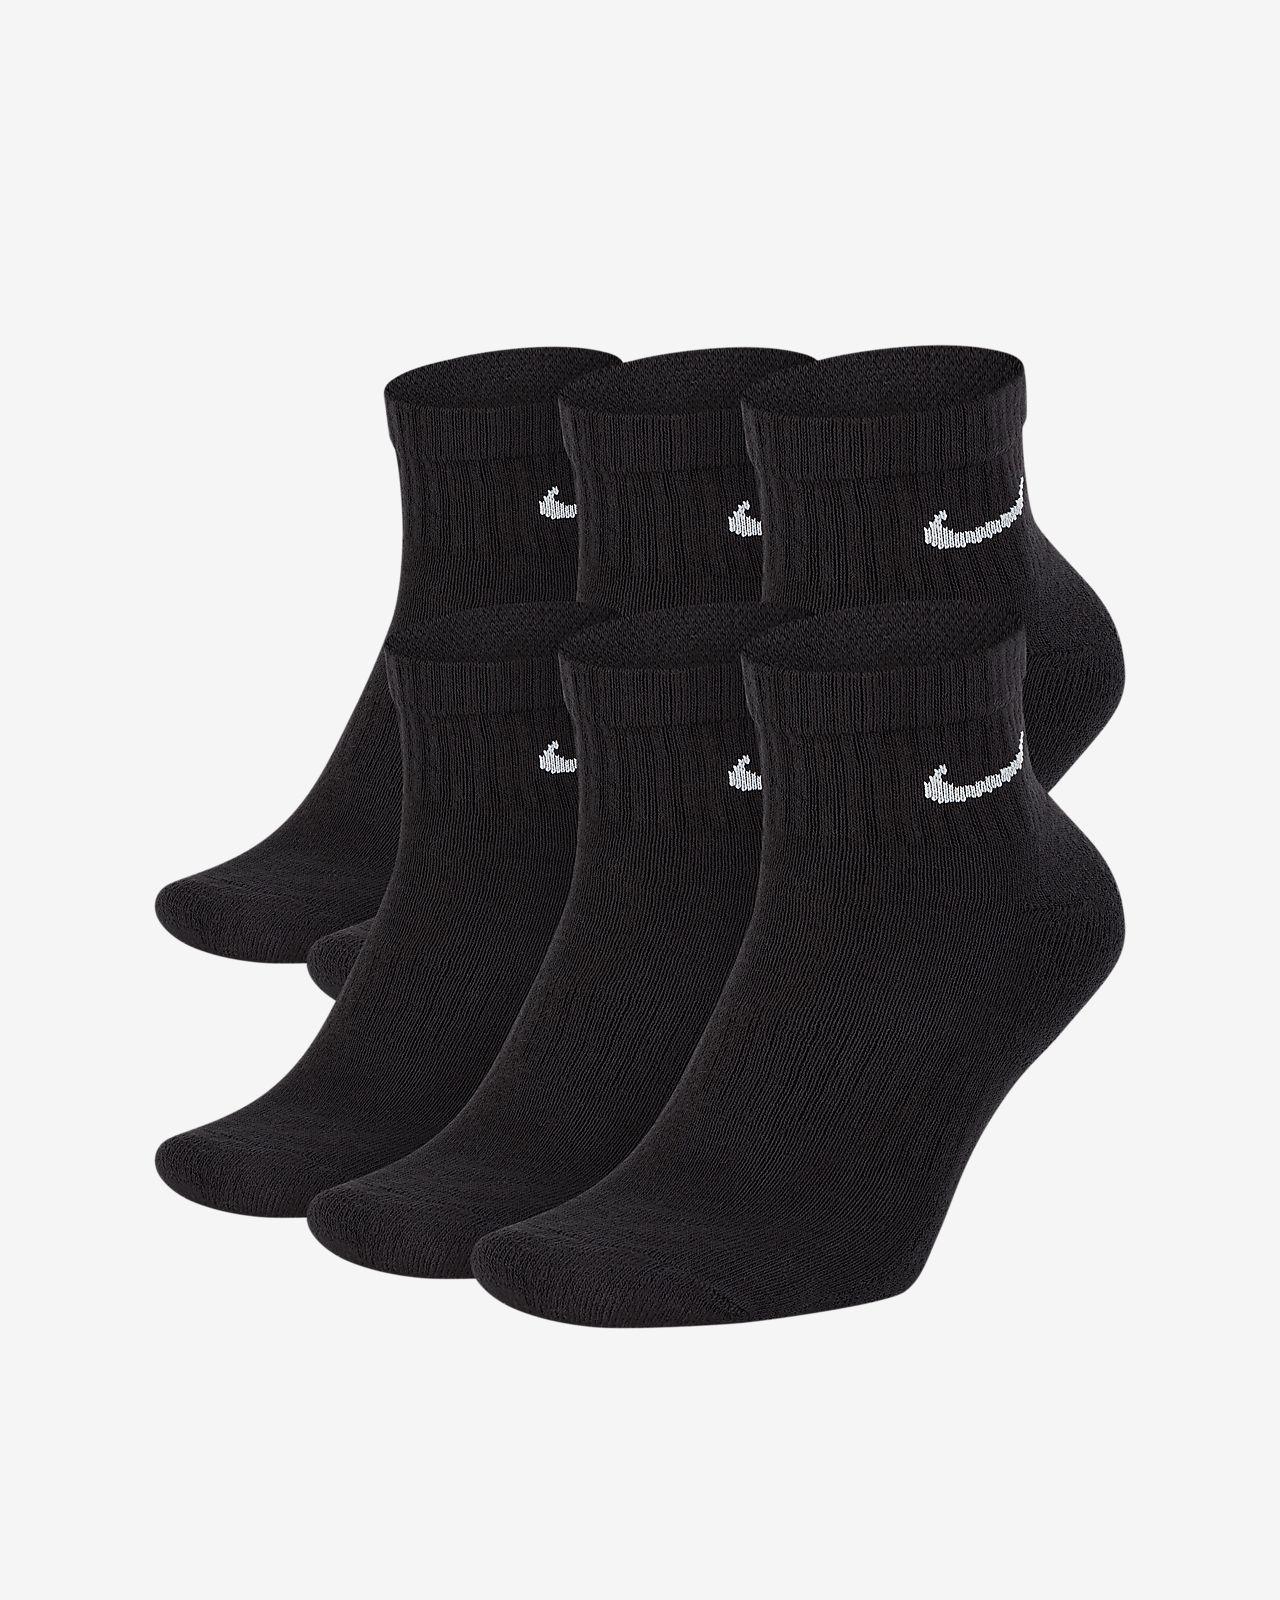 8ef72efe1de2 Nike Everyday Cushion Ankle Training Socks (6 Pair). Nike.com